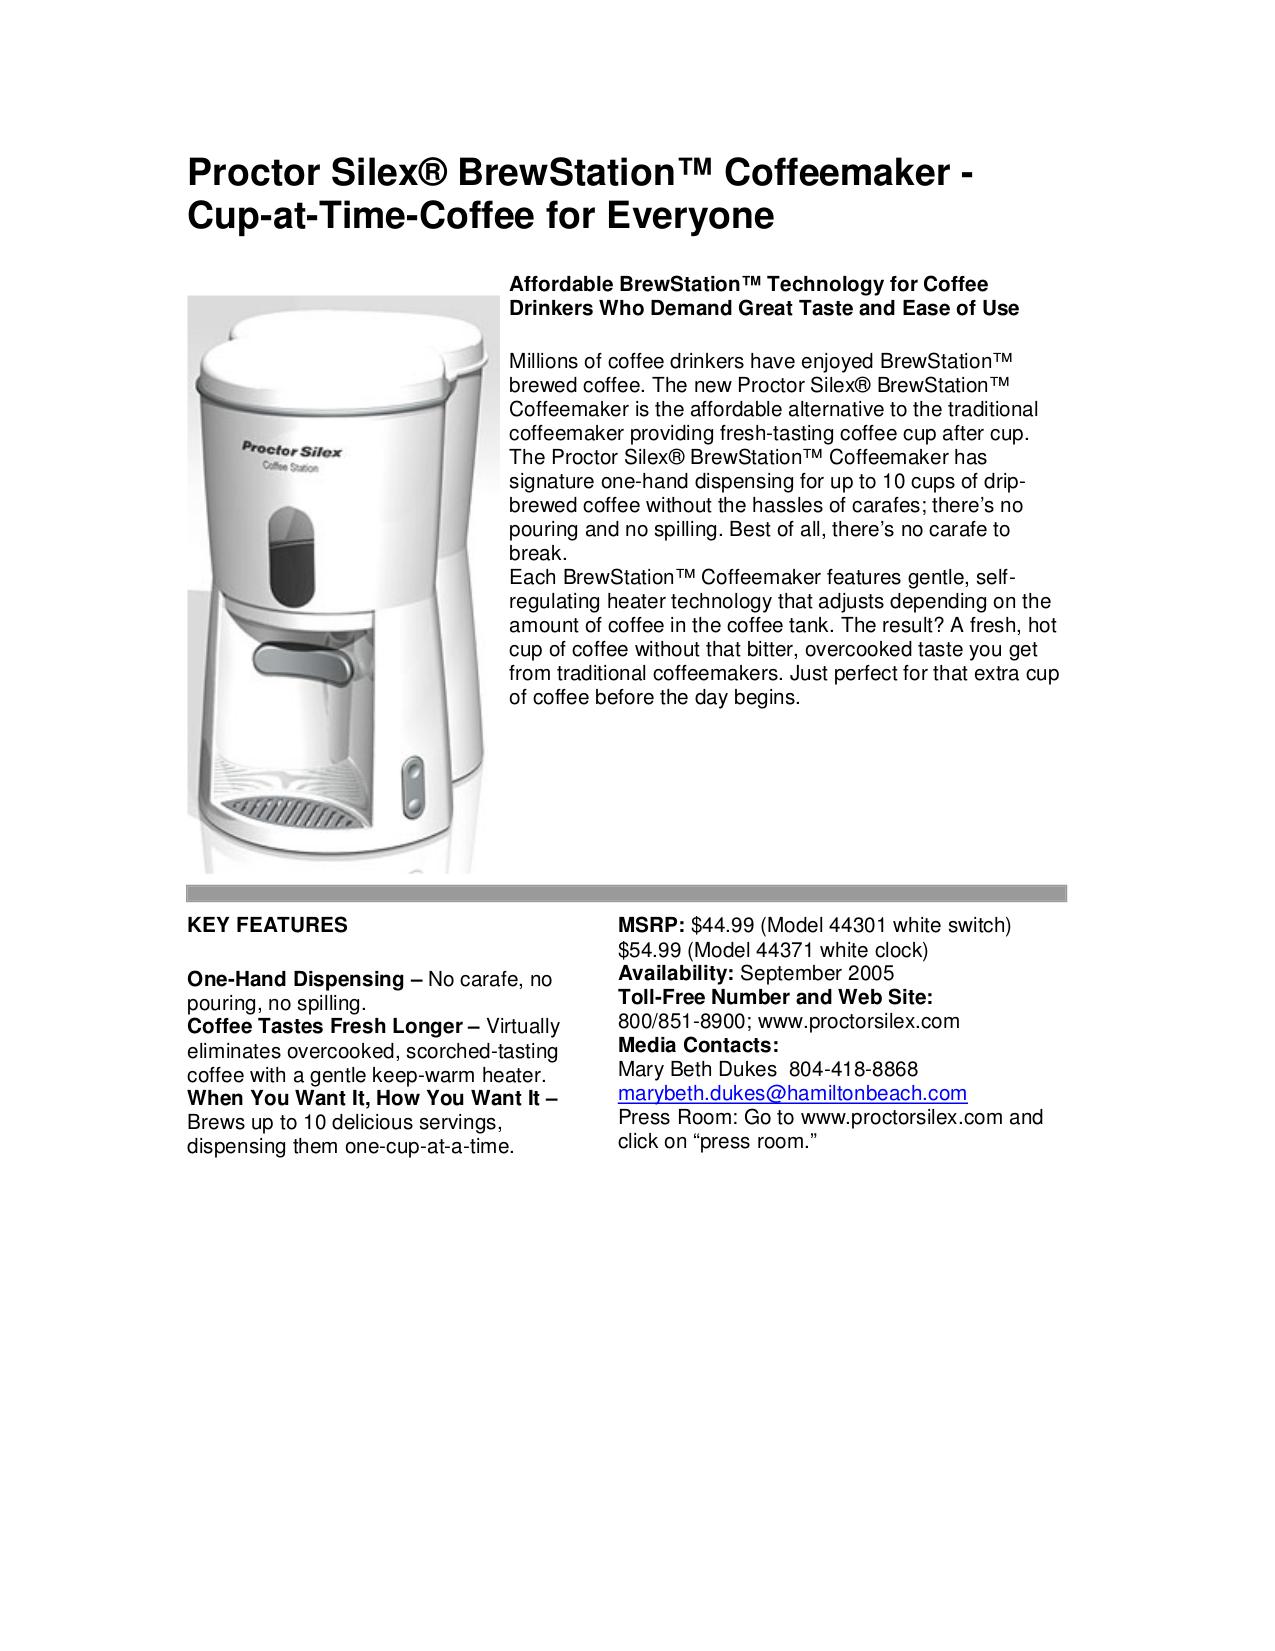 proctor silex coffee maker instructions coffee drinker rh cf jiraygroup com proctor silex coffee maker 45100 manual proctor silex single serve coffee maker manual